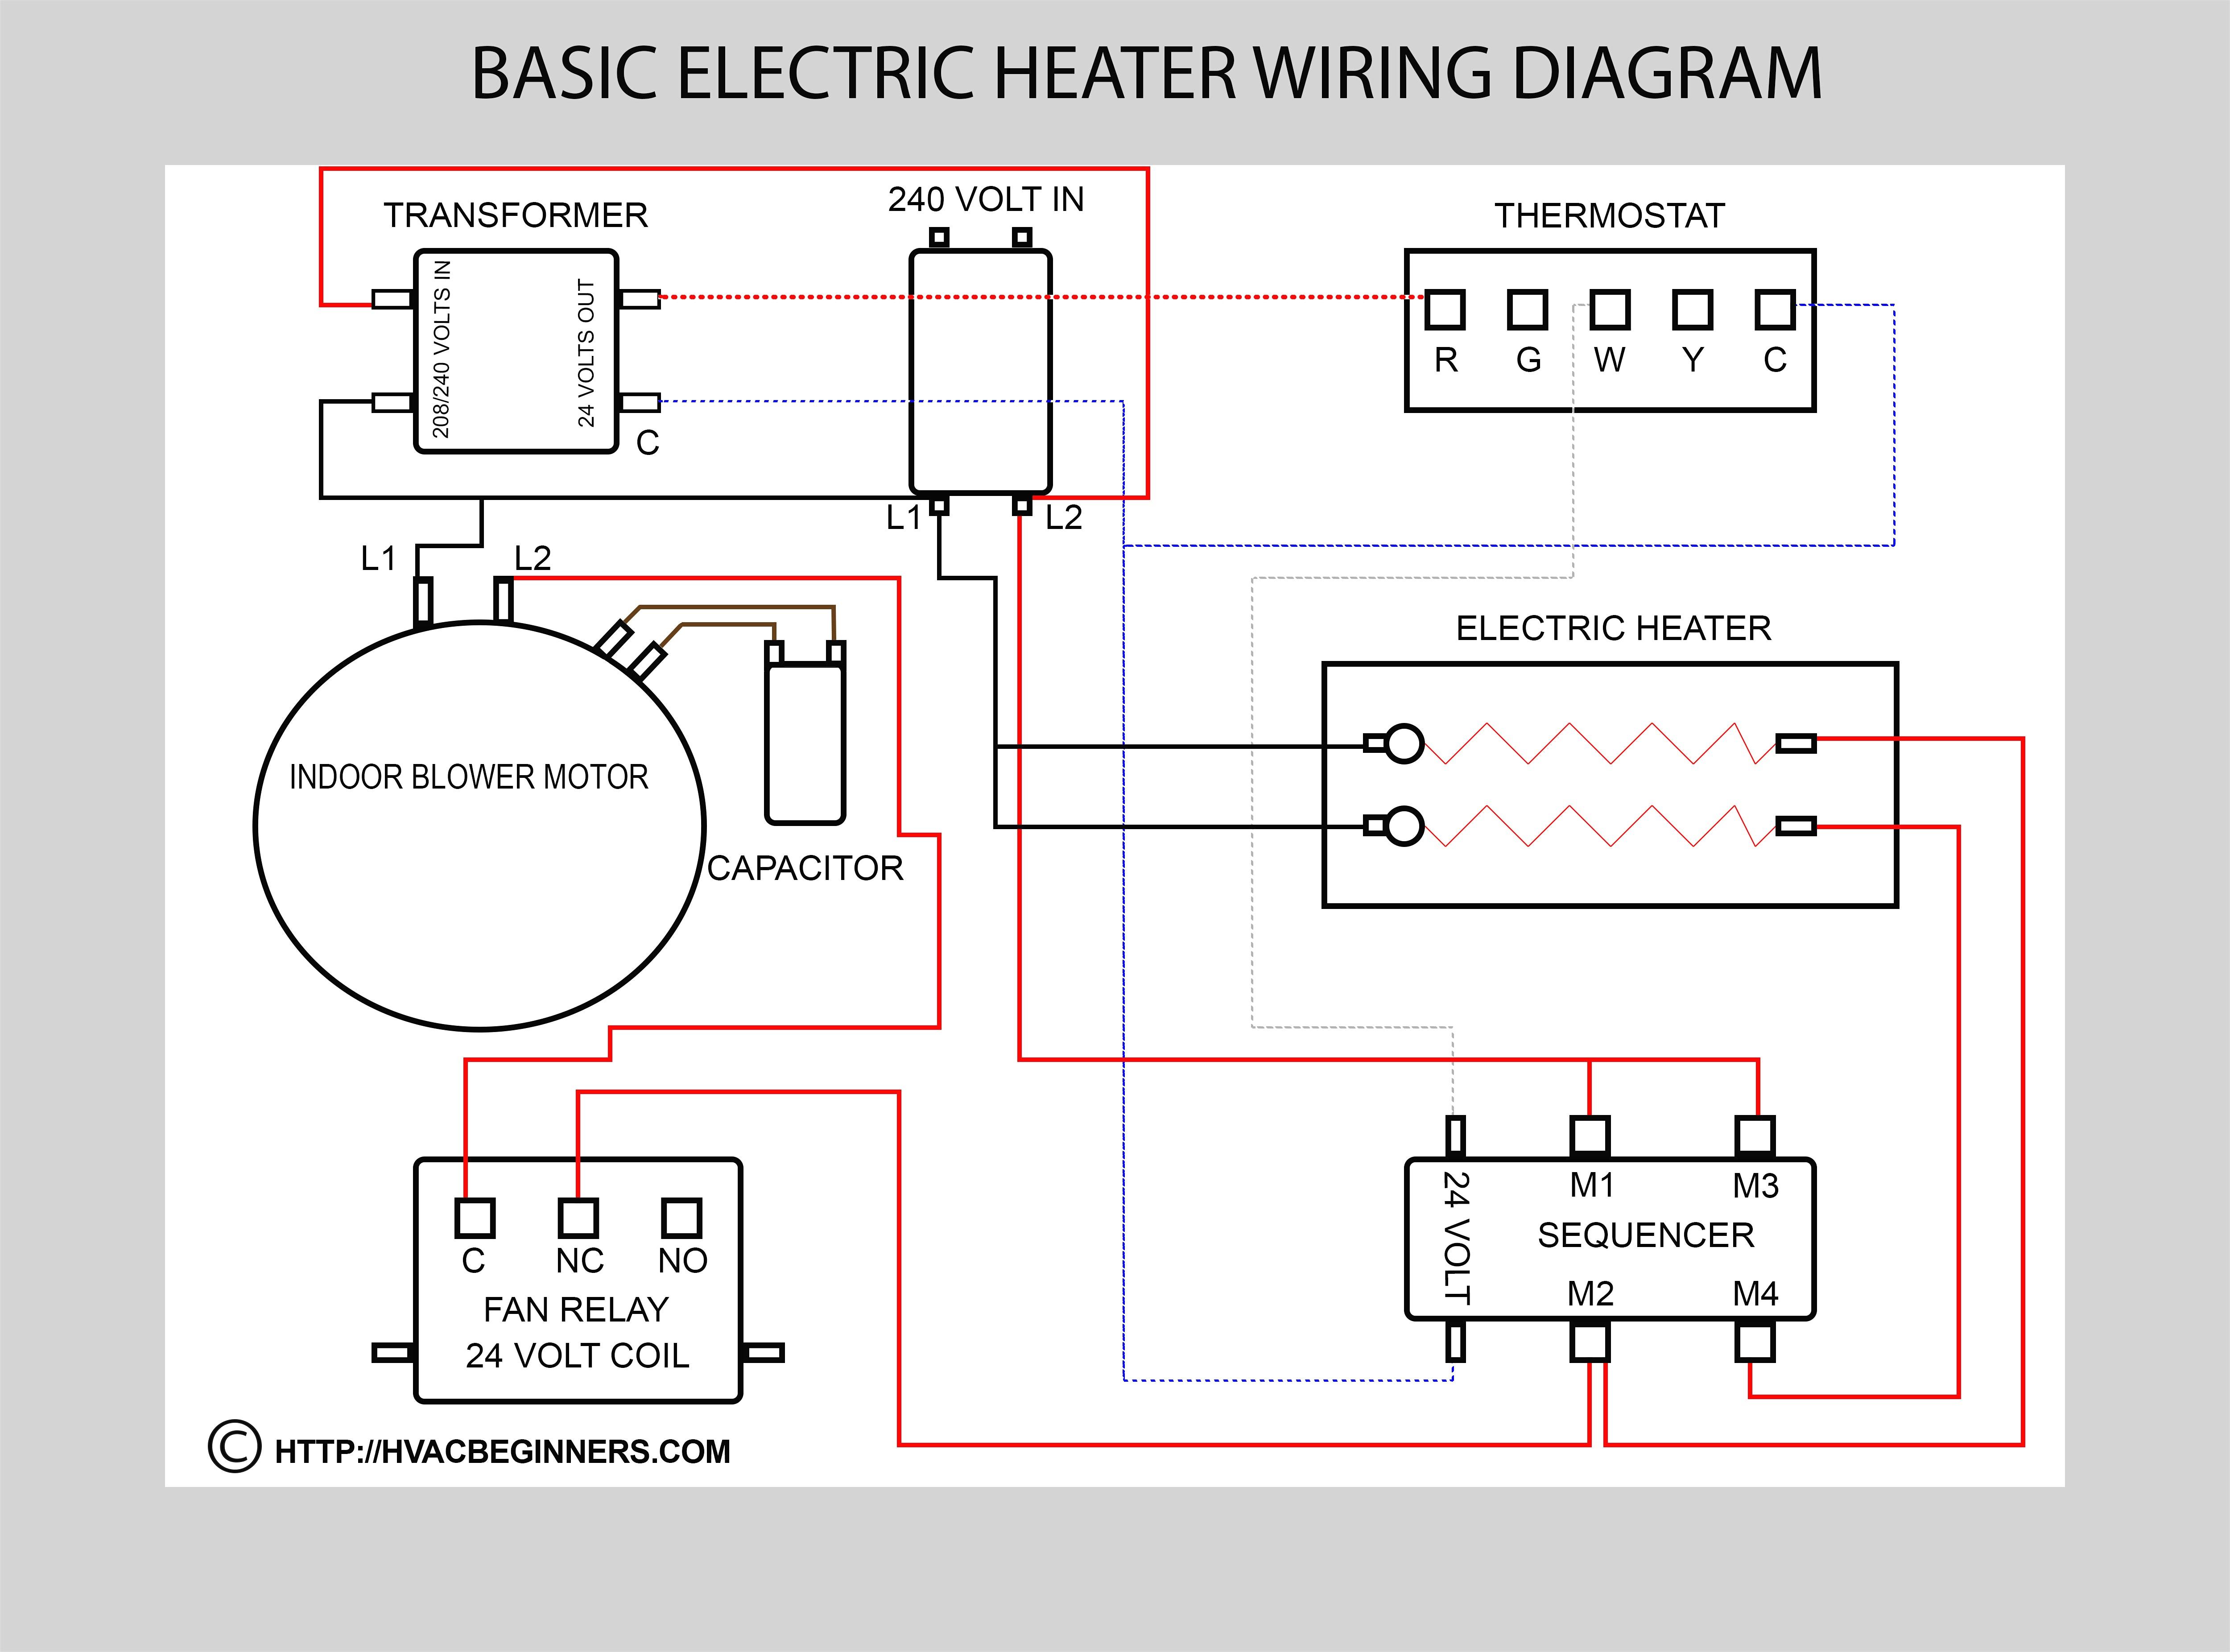 Ac Wiring Diagram - Data Wiring Diagram Schematic - Air Compressor Wiring Diagram